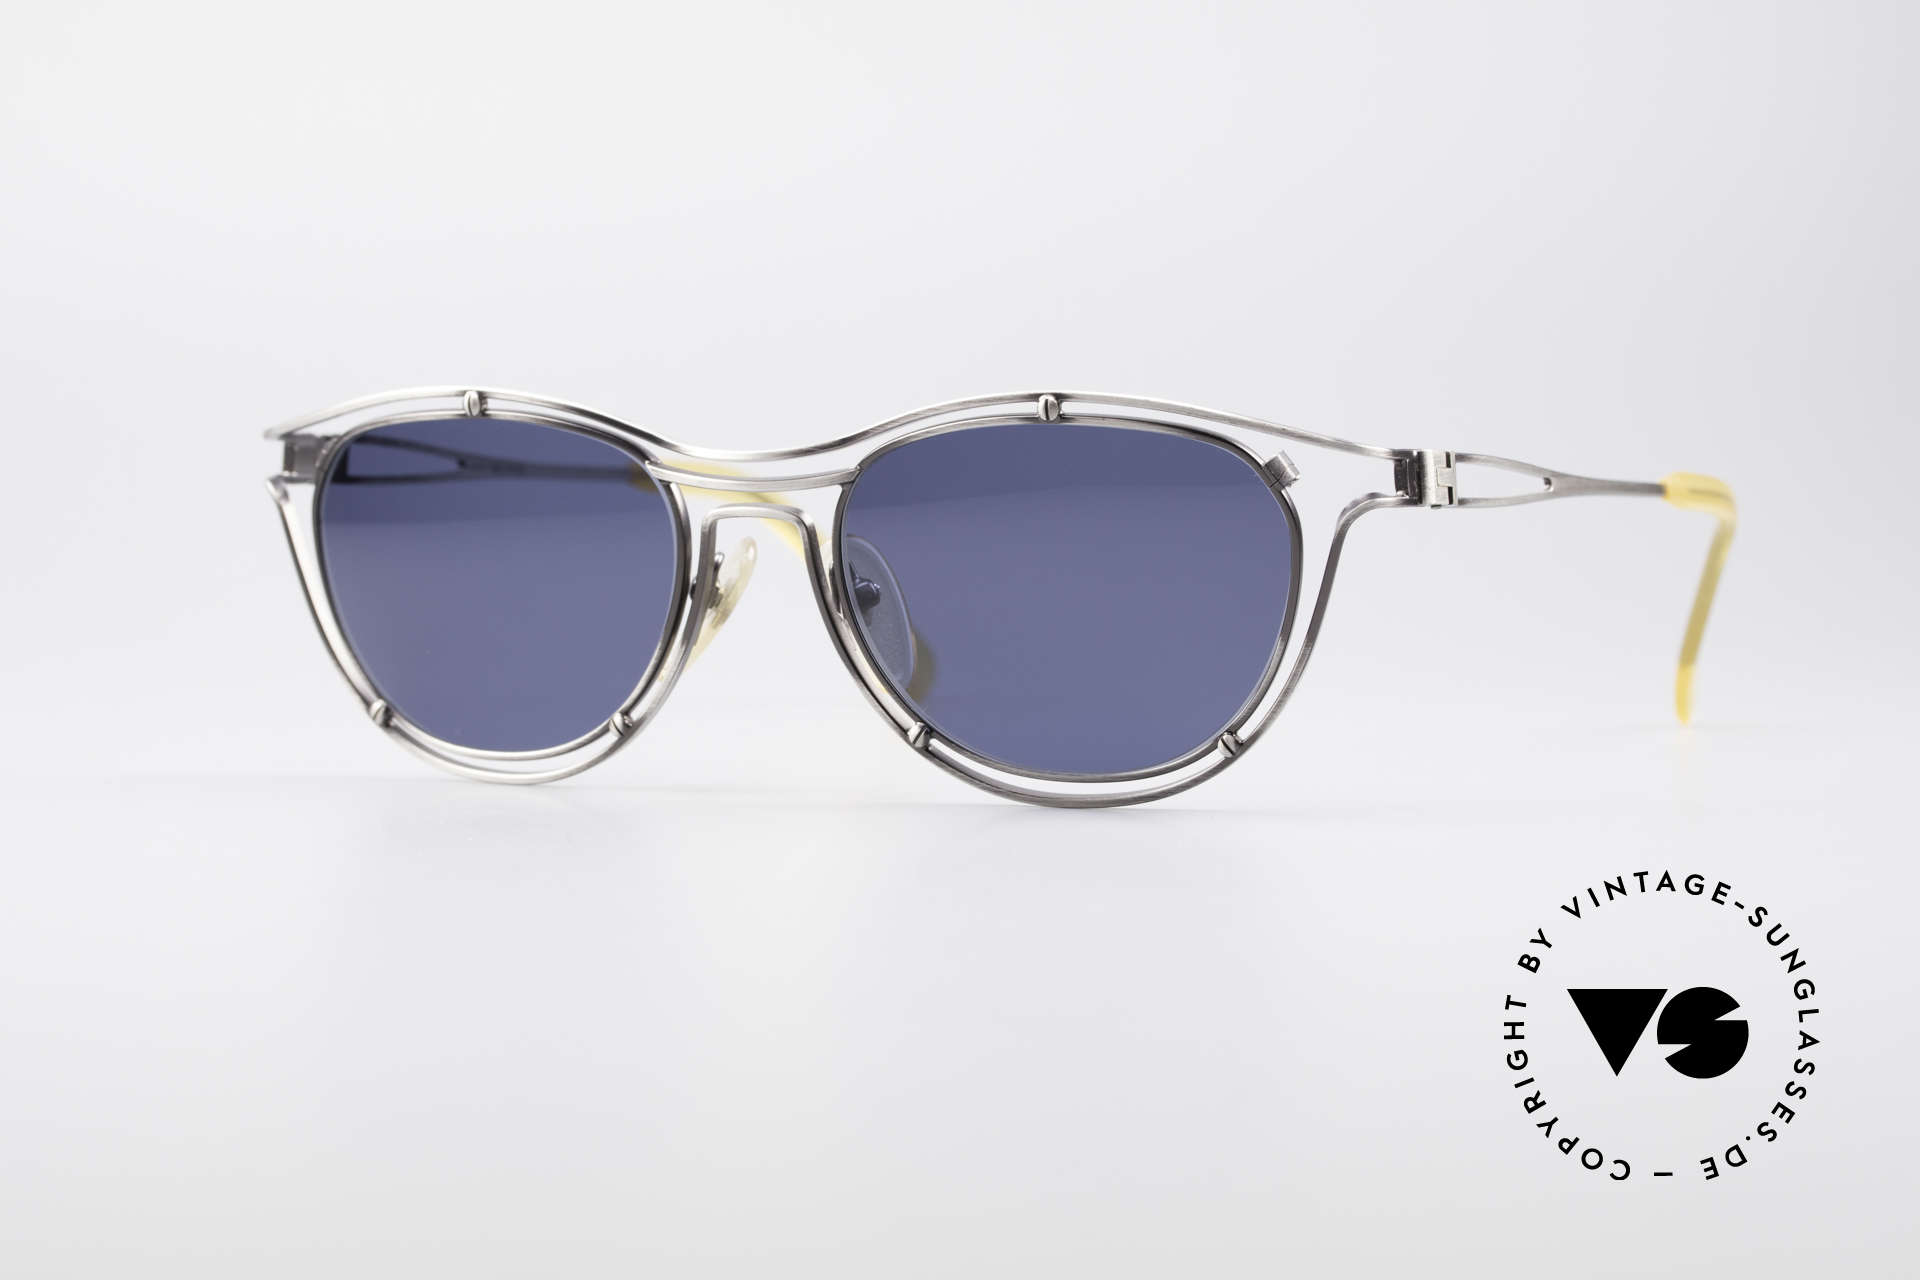 Jean Paul Gaultier 56-2176 True Designer Sunglasses, spectacular Jean Paul GAULTIER designer shades, Made for Men and Women